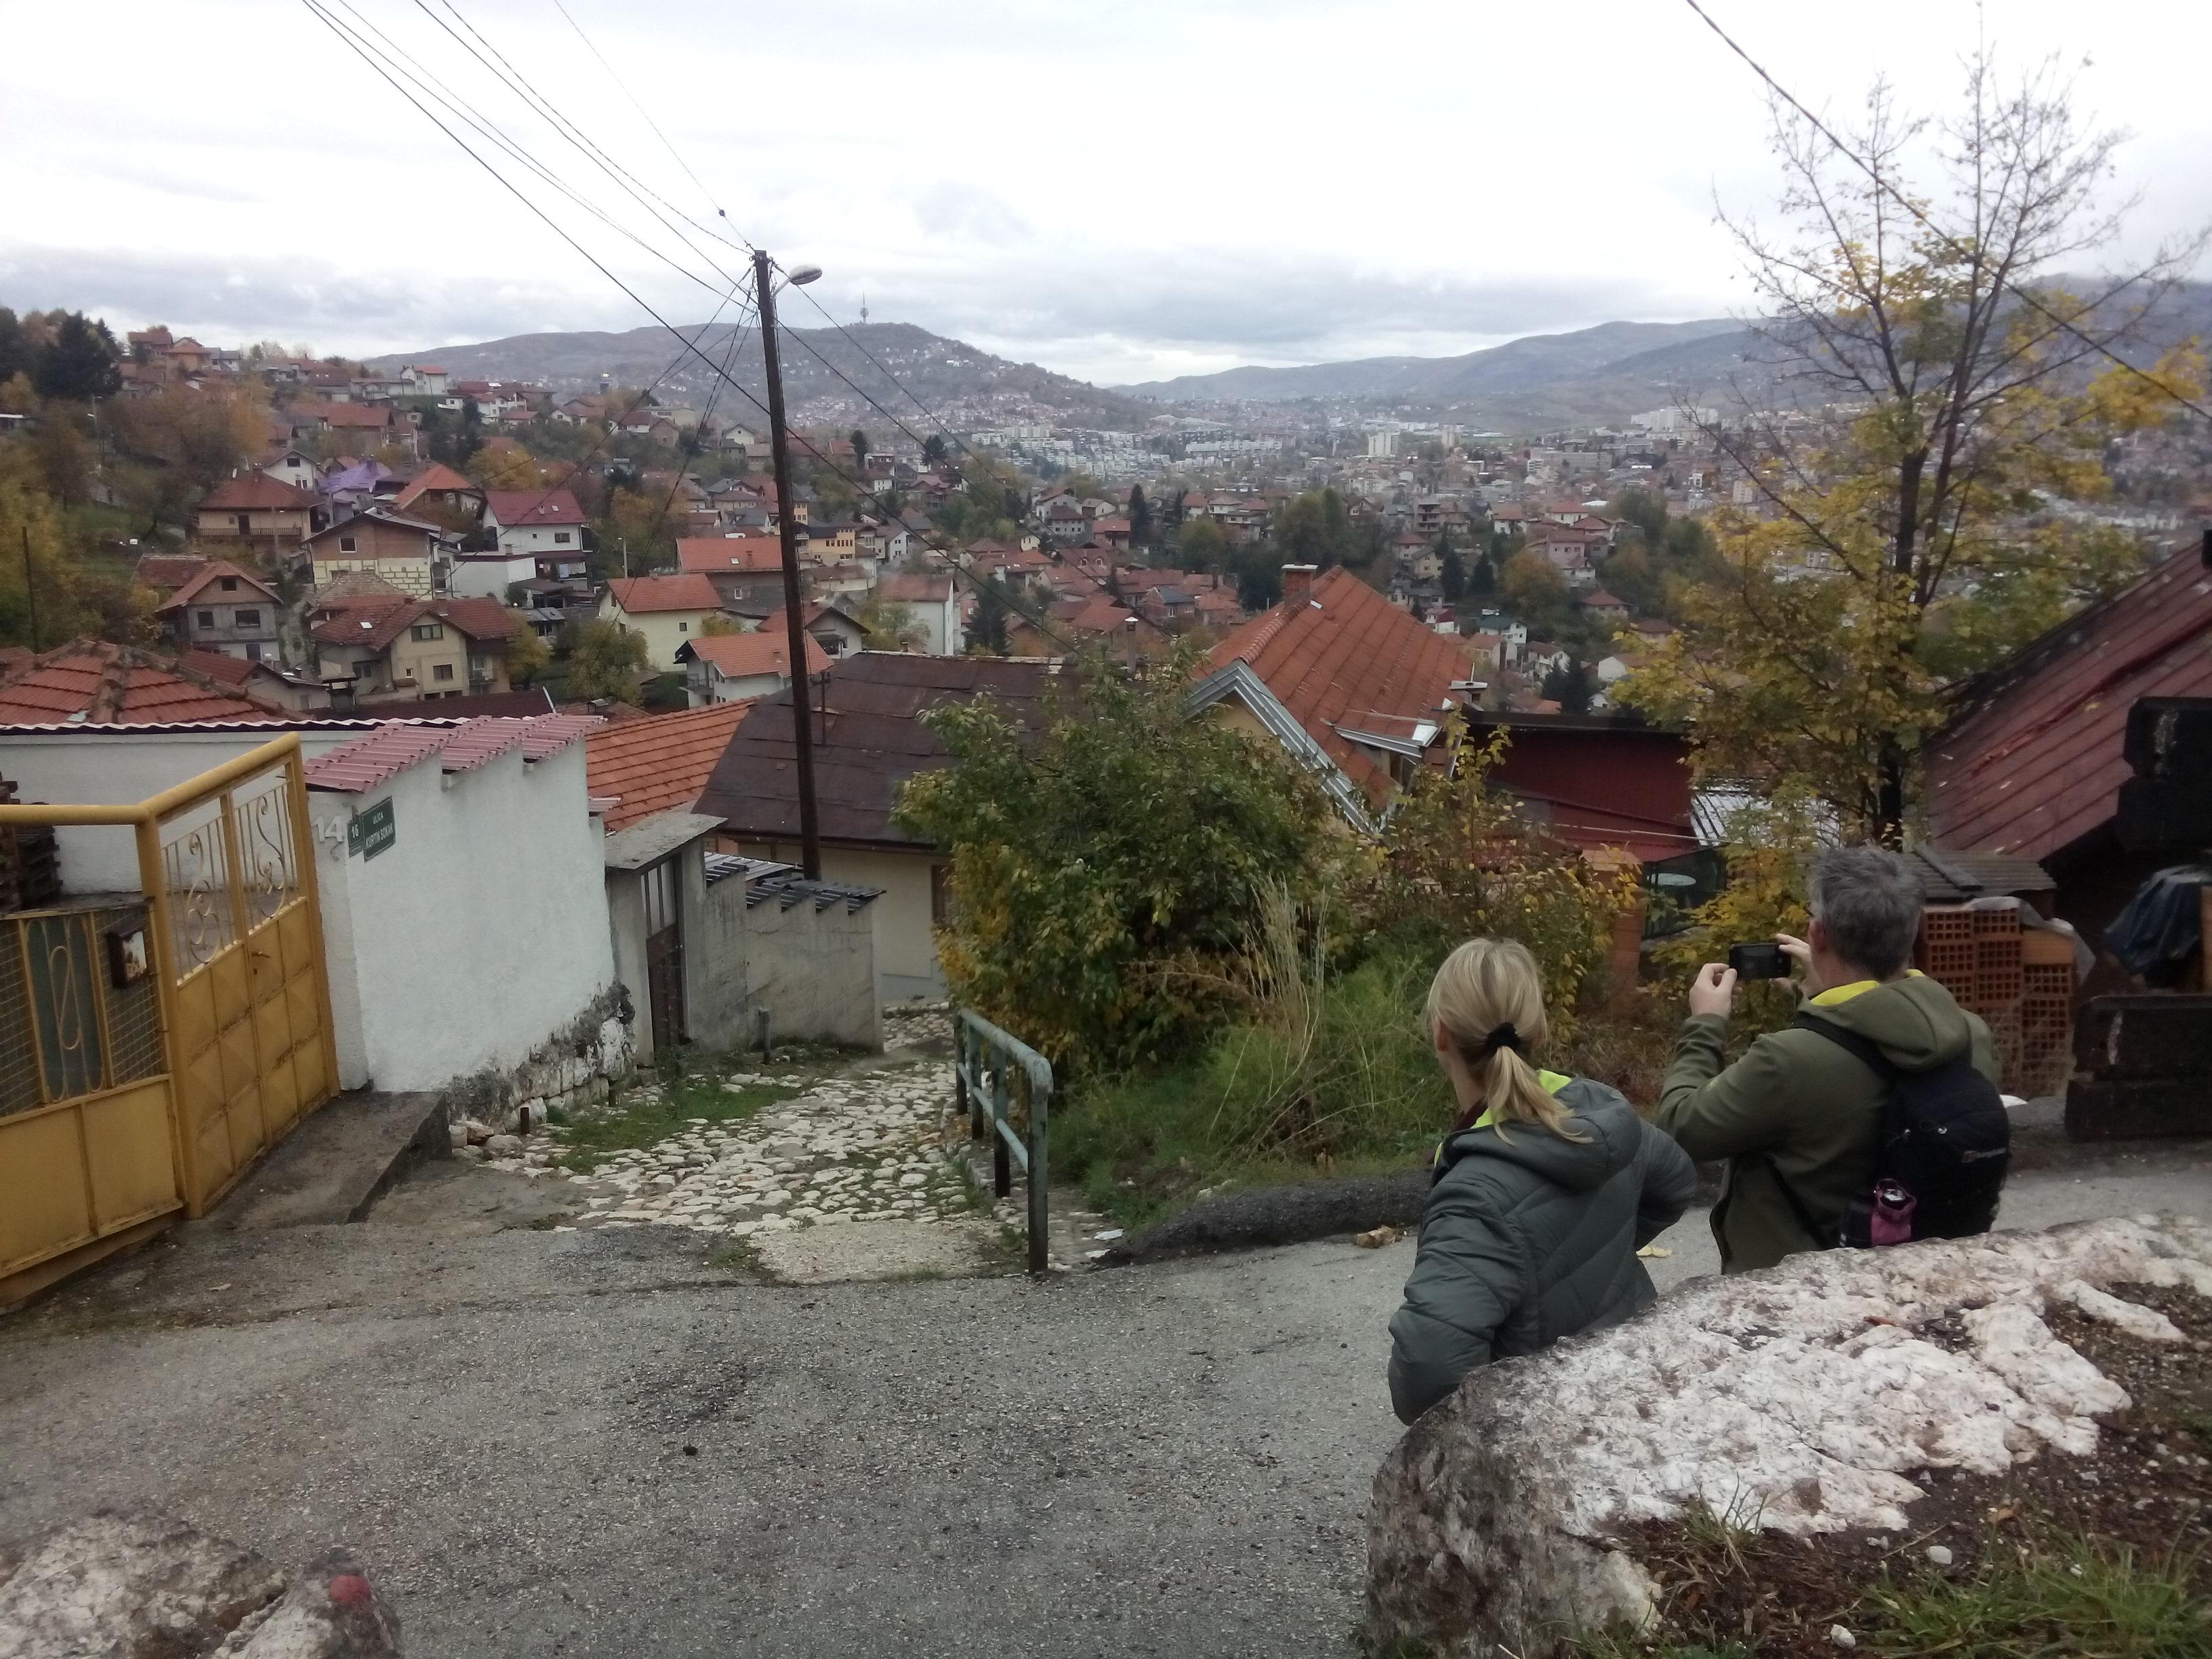 https://i.amy.gy/2017-sarajevo/IMG_20171023_120106.jpg